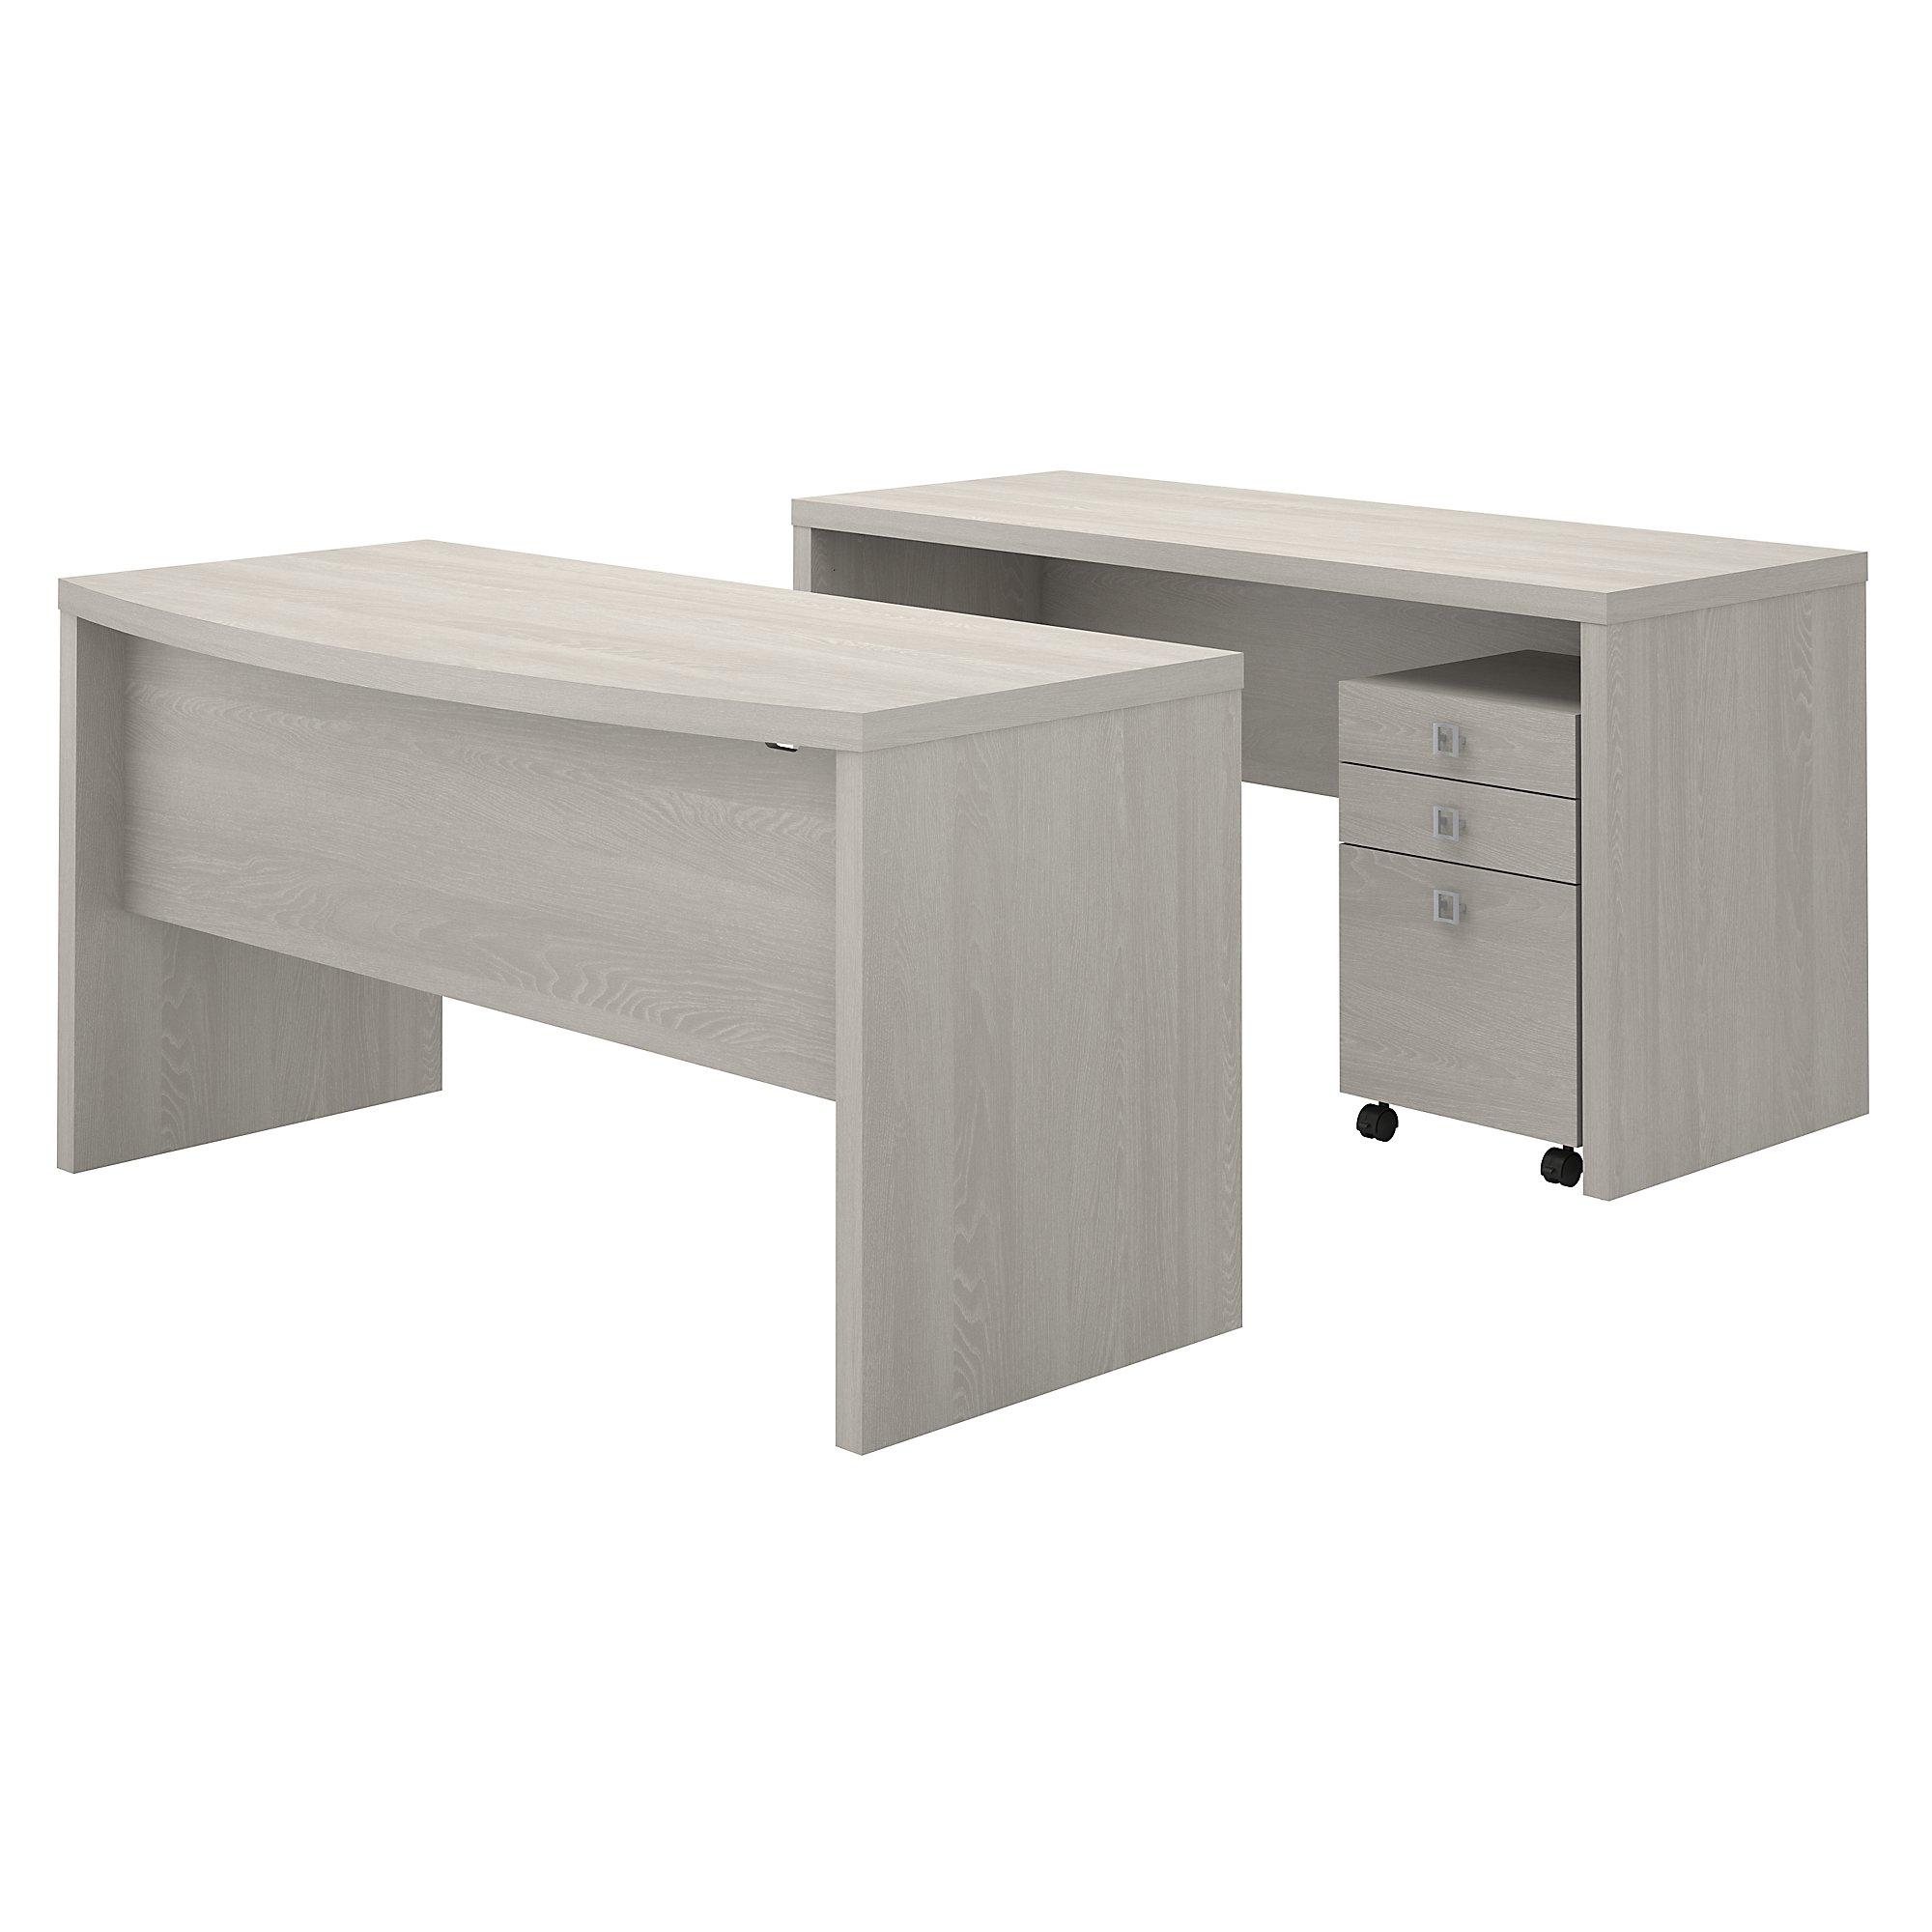 gray sand echo furniture set